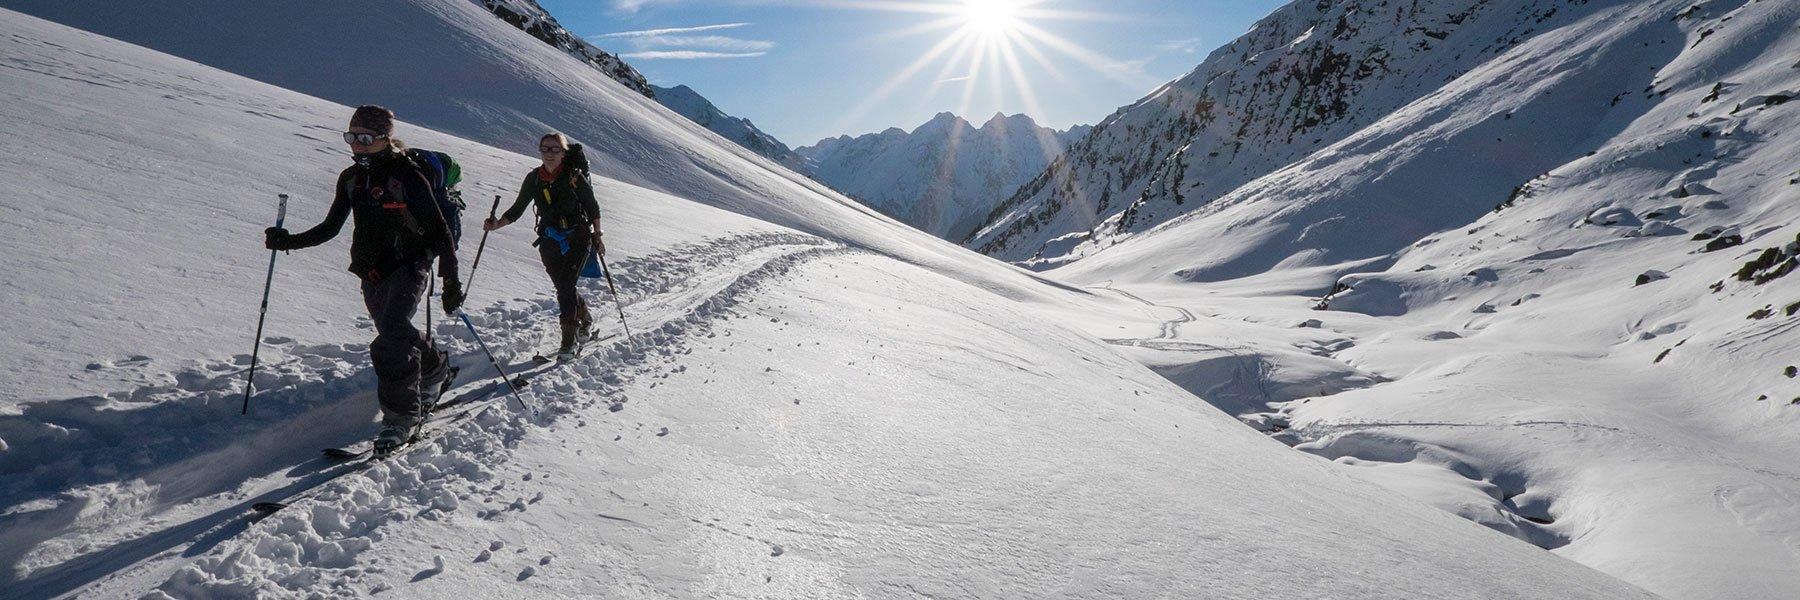 Skitour entlang des Winnebach